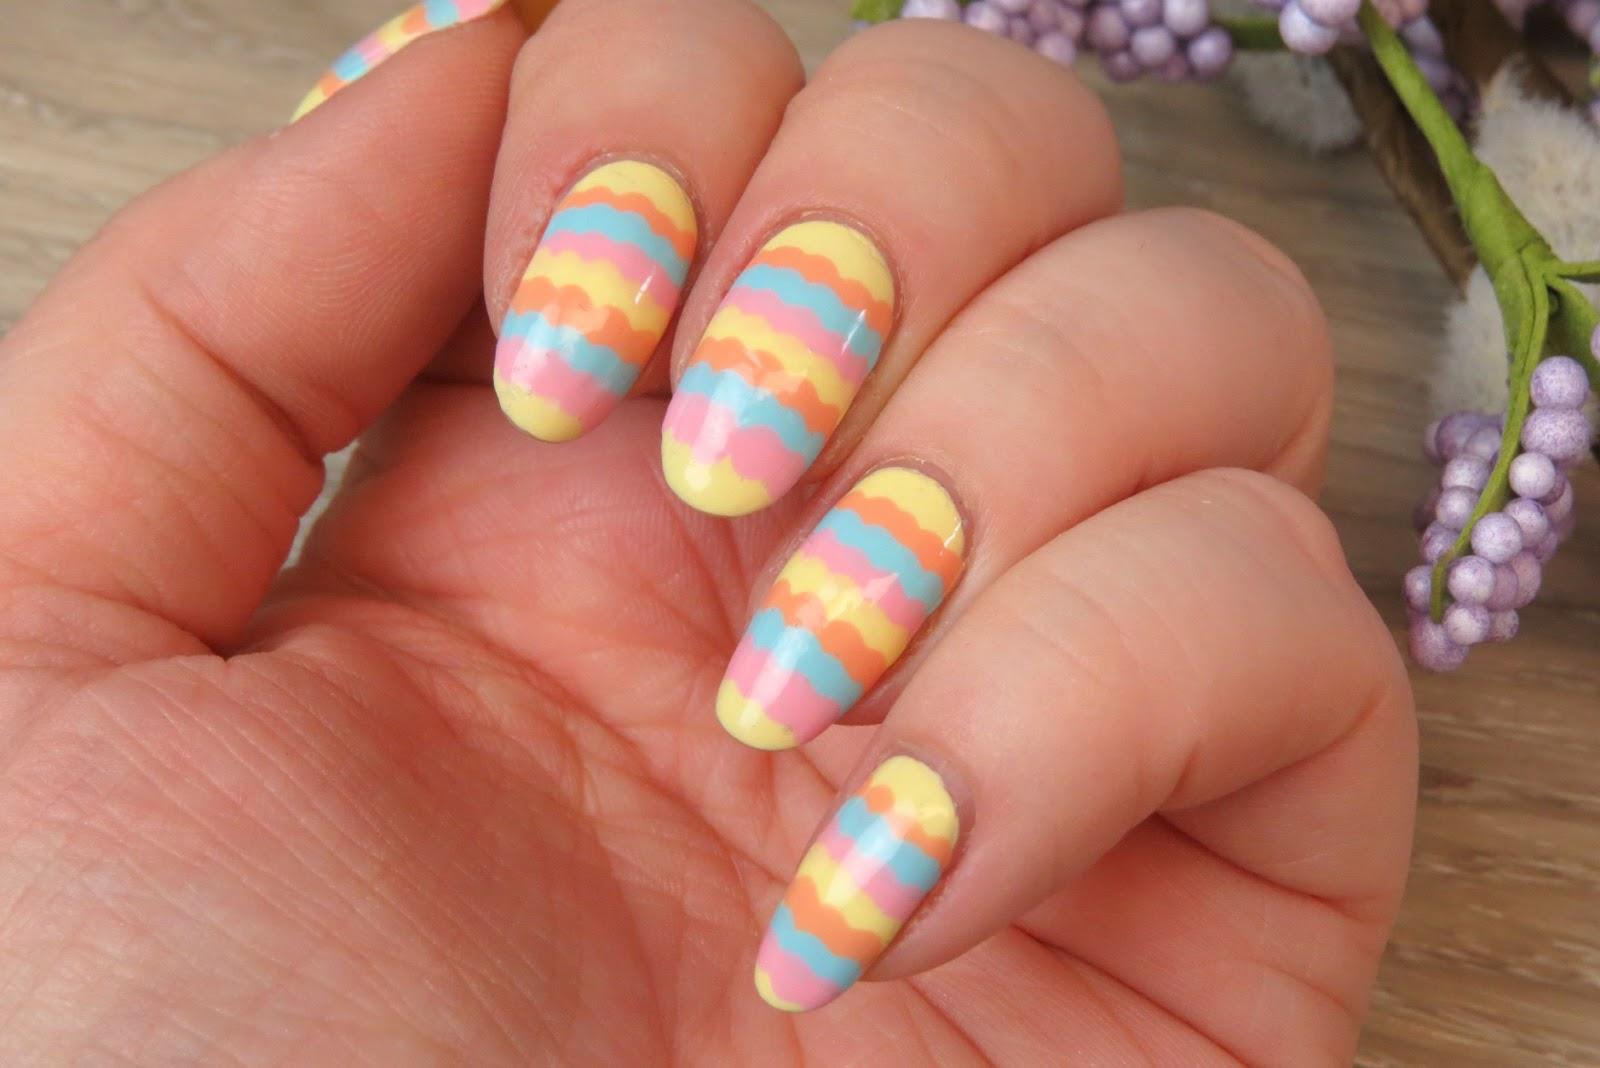 Nail Art: Scalloped Stripes | Kaitlyn Elisabeth Beauty